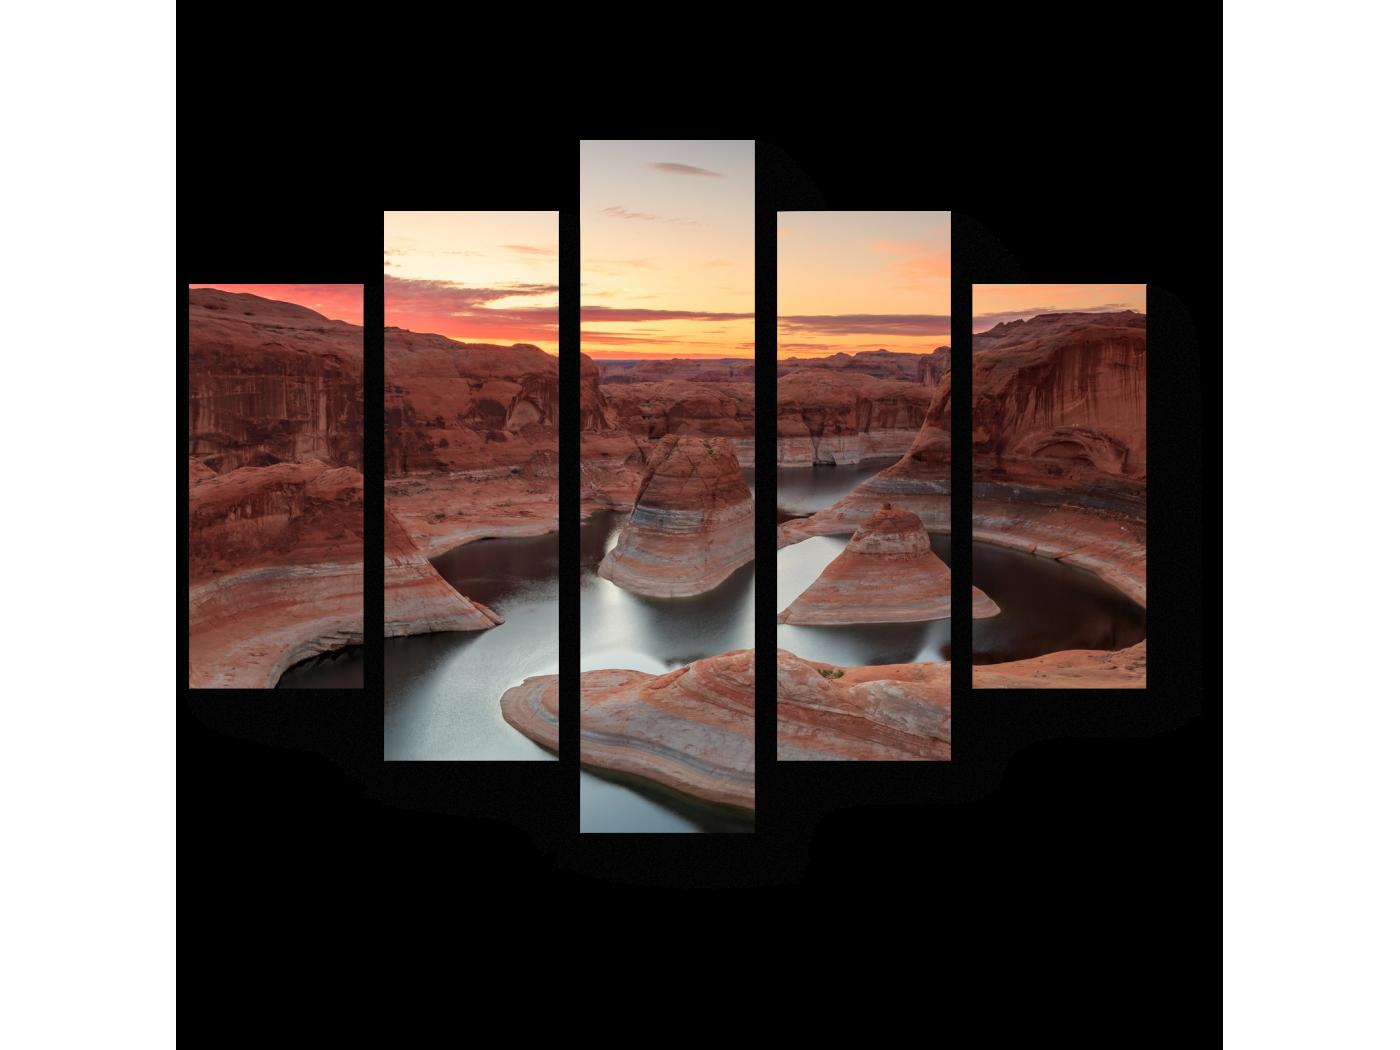 Модульная картина Озеро Пауэлл в Аризоне (75x60) фото